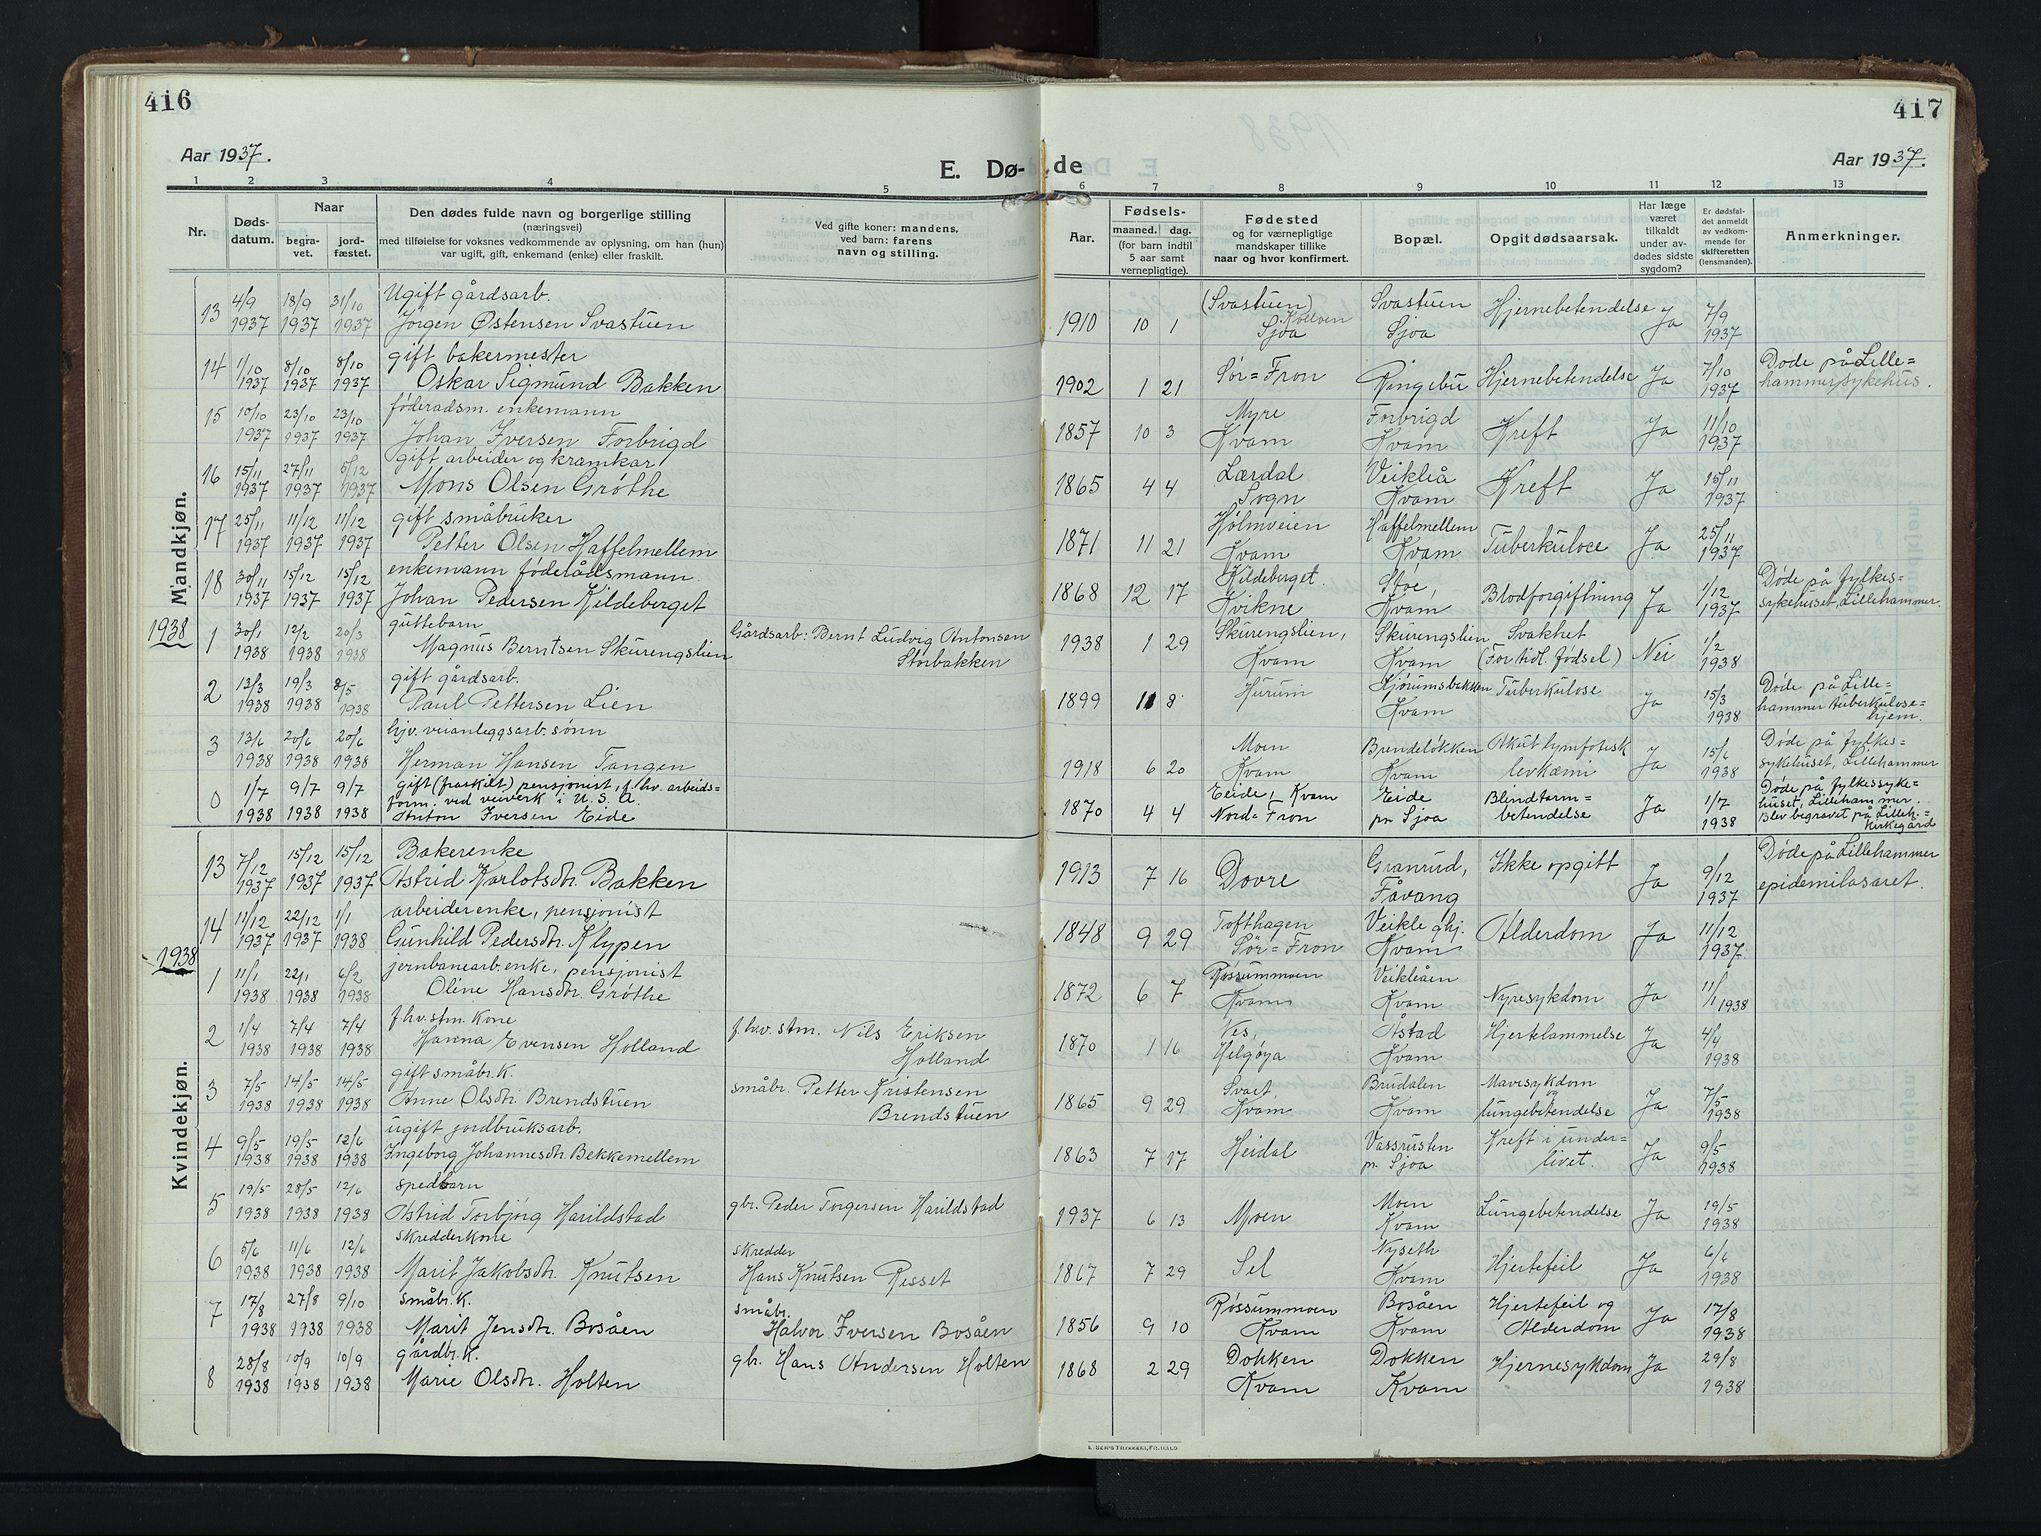 SAH, Nord-Fron prestekontor, Klokkerbok nr. 8, 1915-1948, s. 416-417